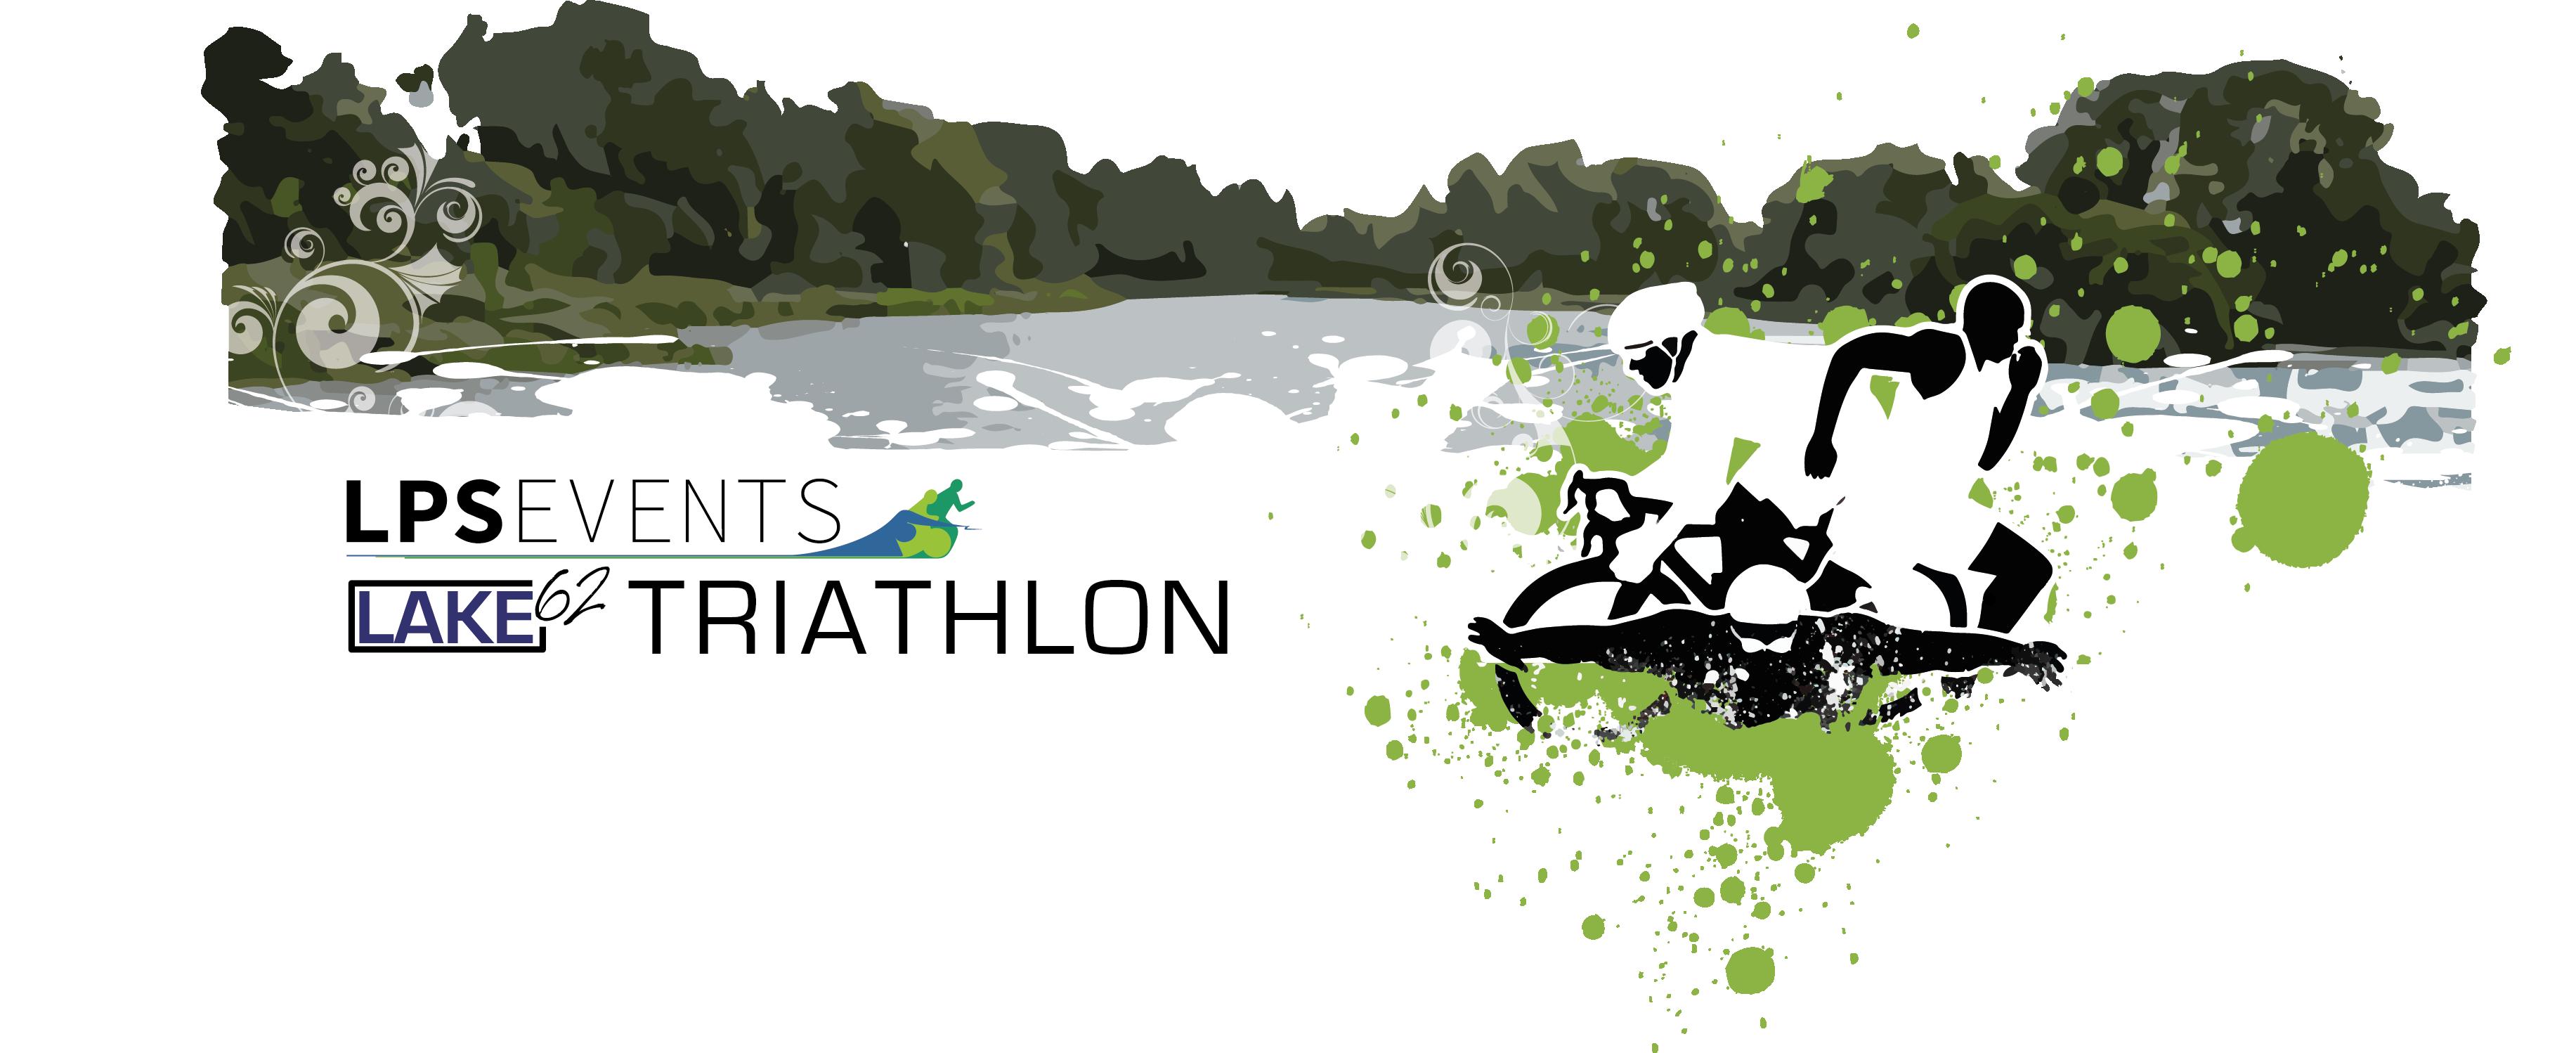 Cotswolds Lake 62 Standard Triathlon, Saturday - cover image